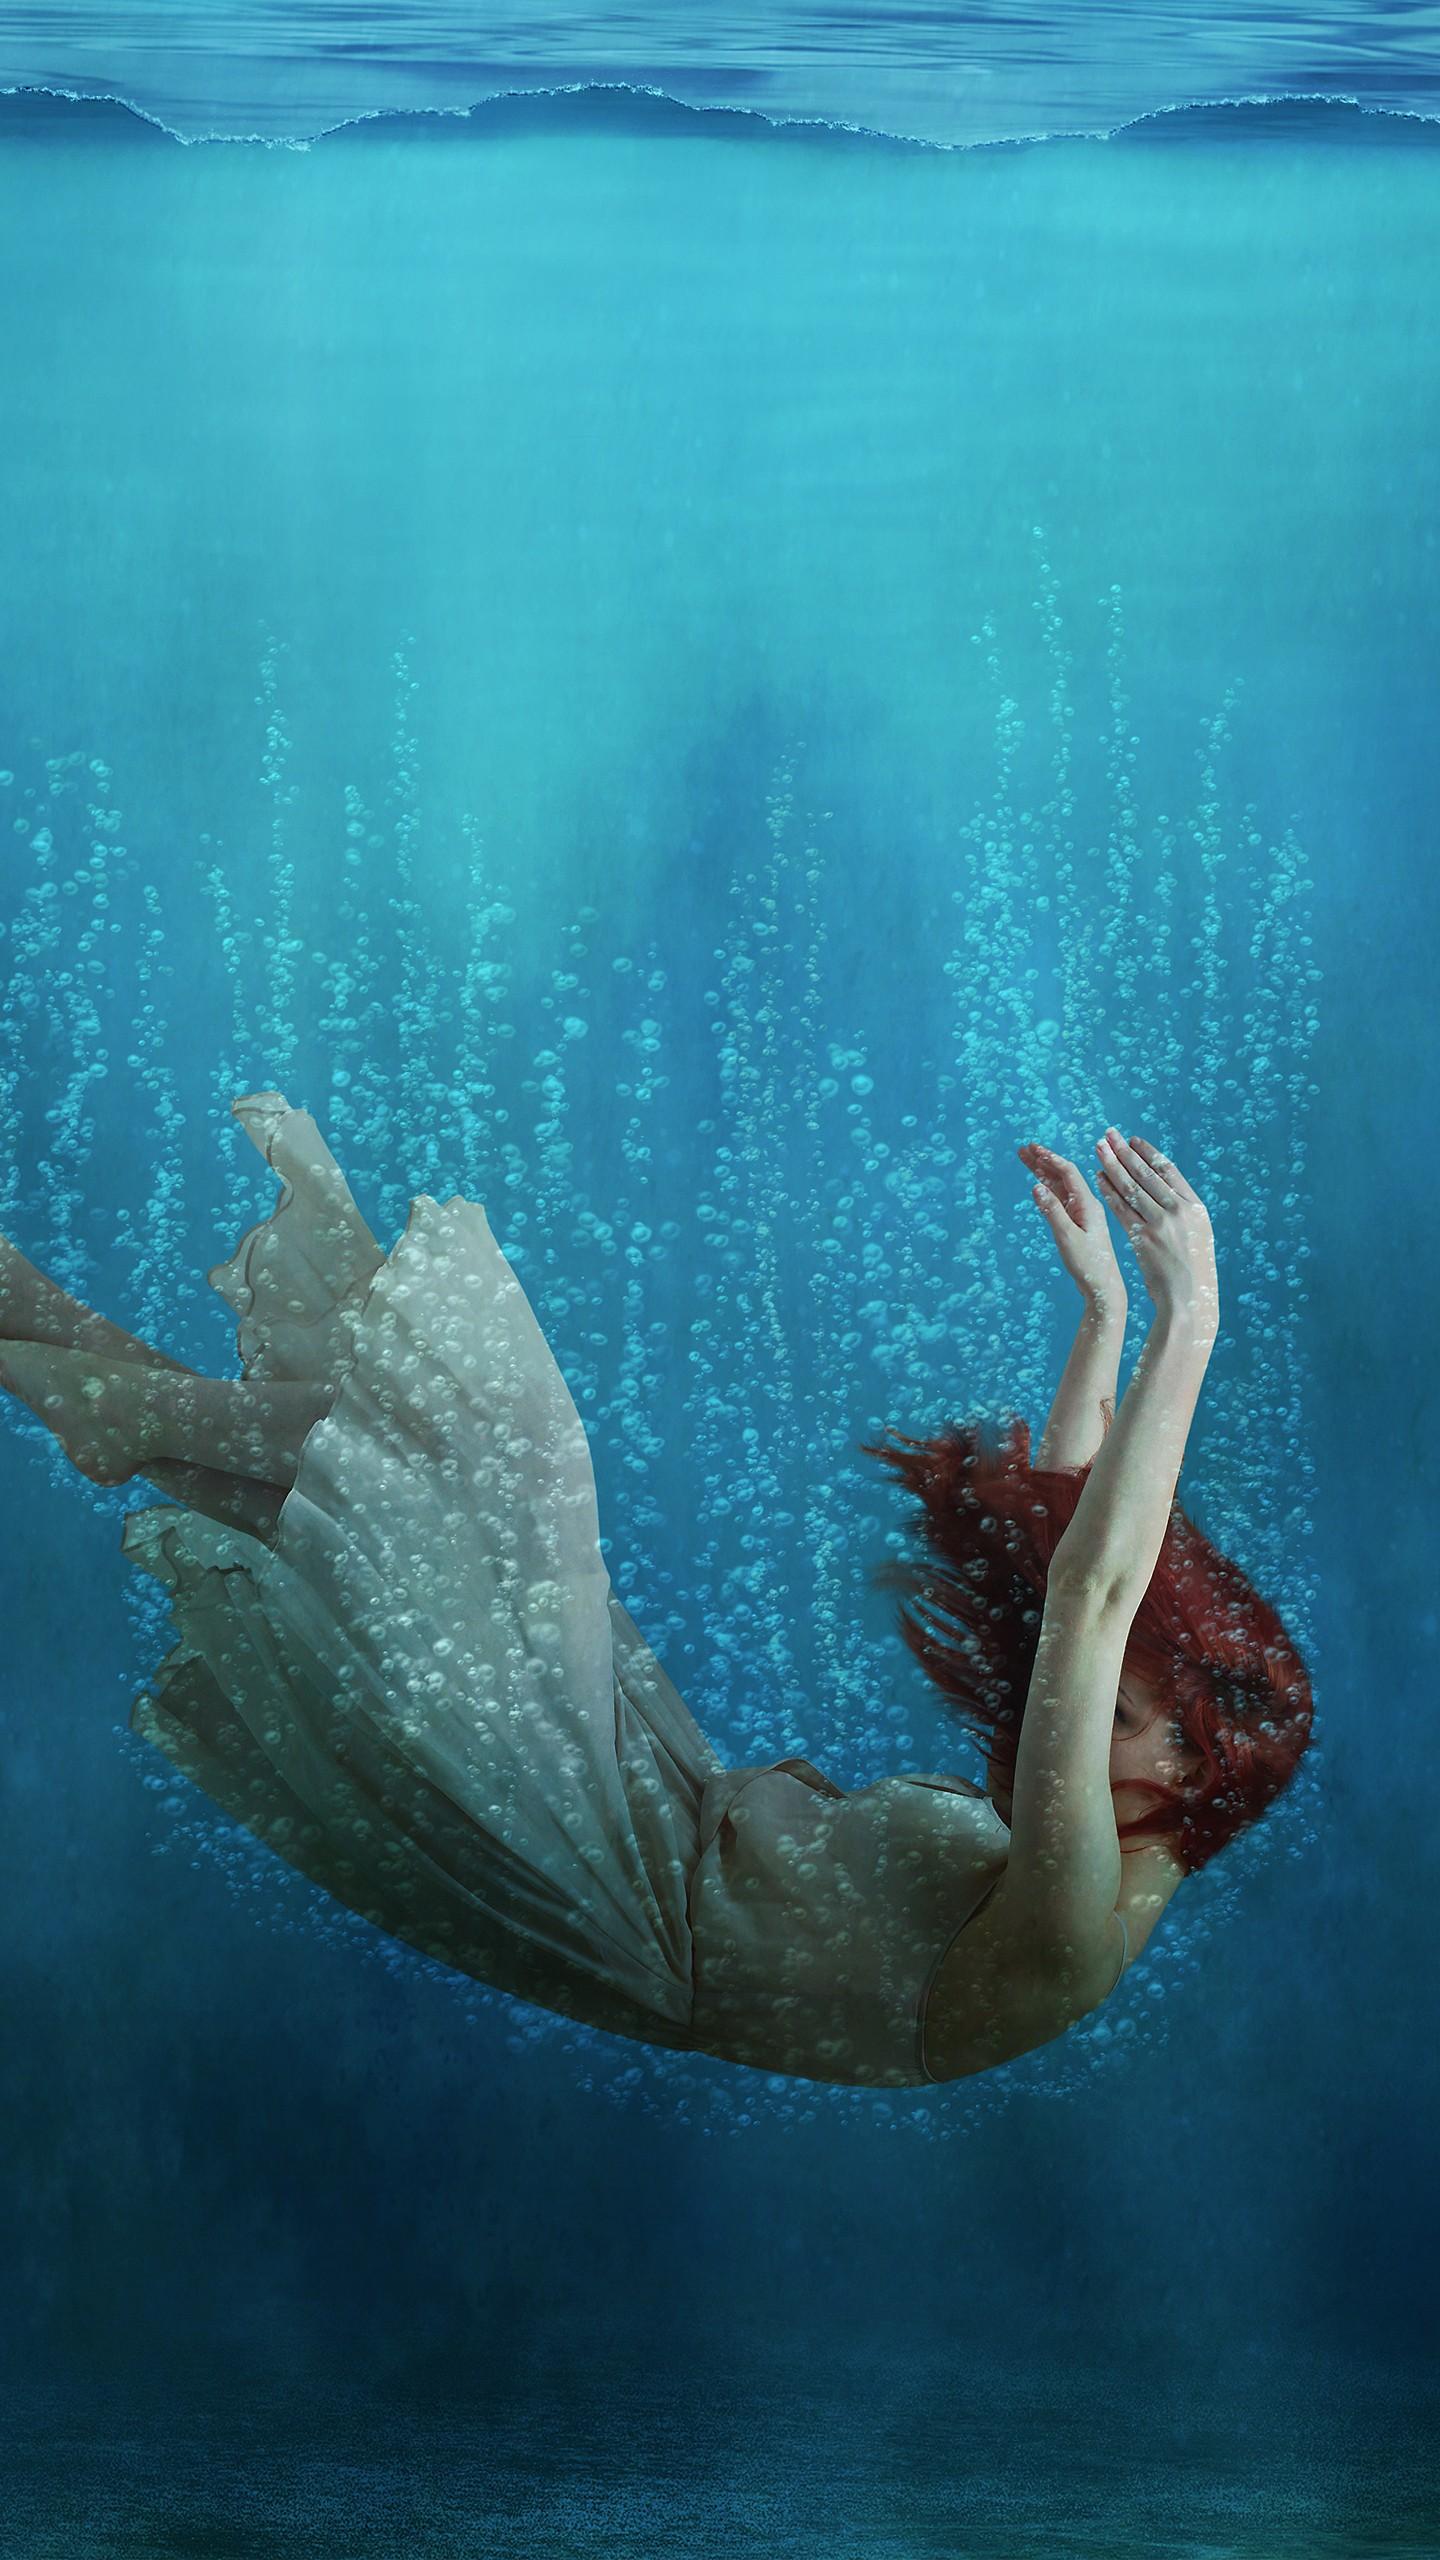 Fall Owl Wallpaper Underwater Girl Dream Wallpapers Hd Wallpapers Id 23094